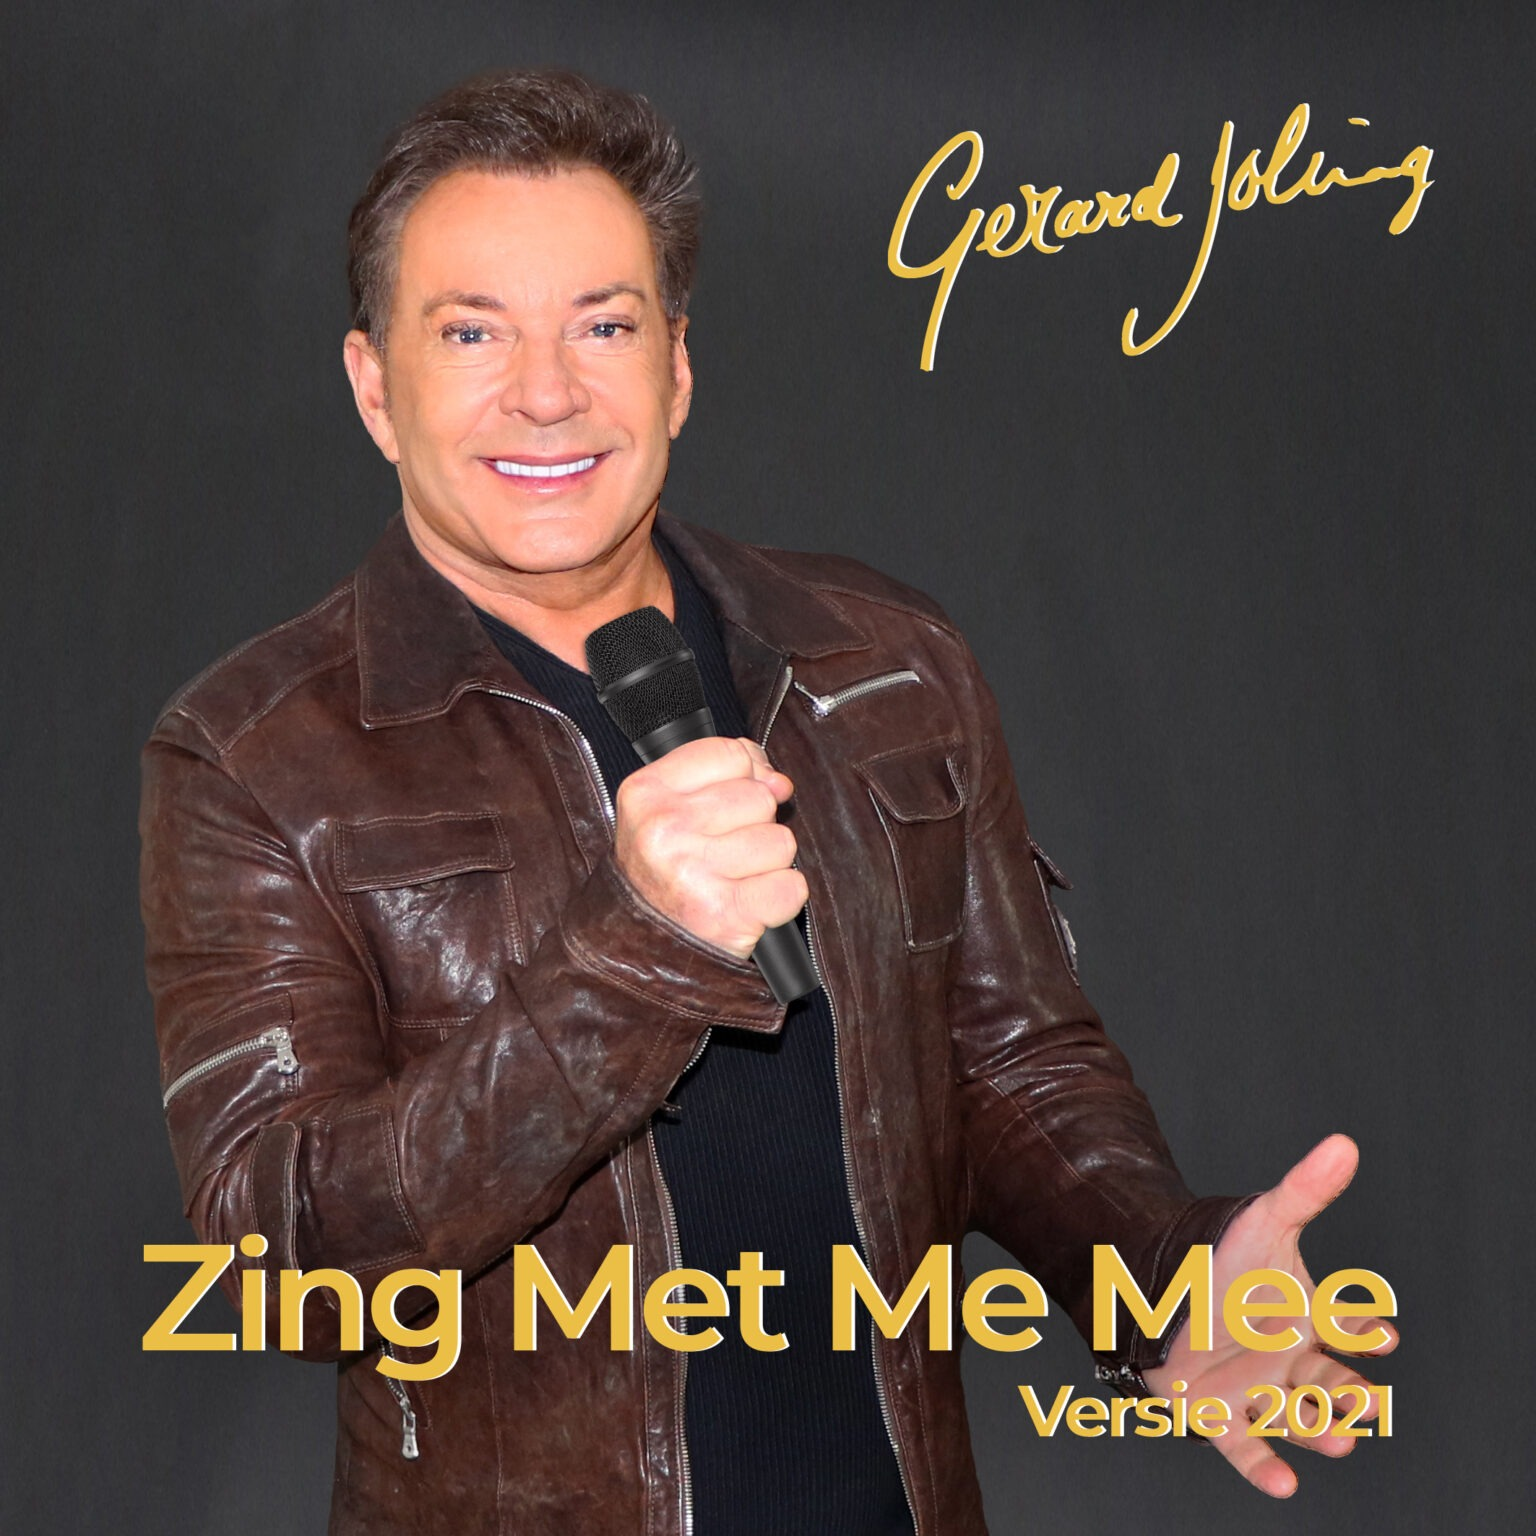 Zing Met Me Mee (Versie 2021)